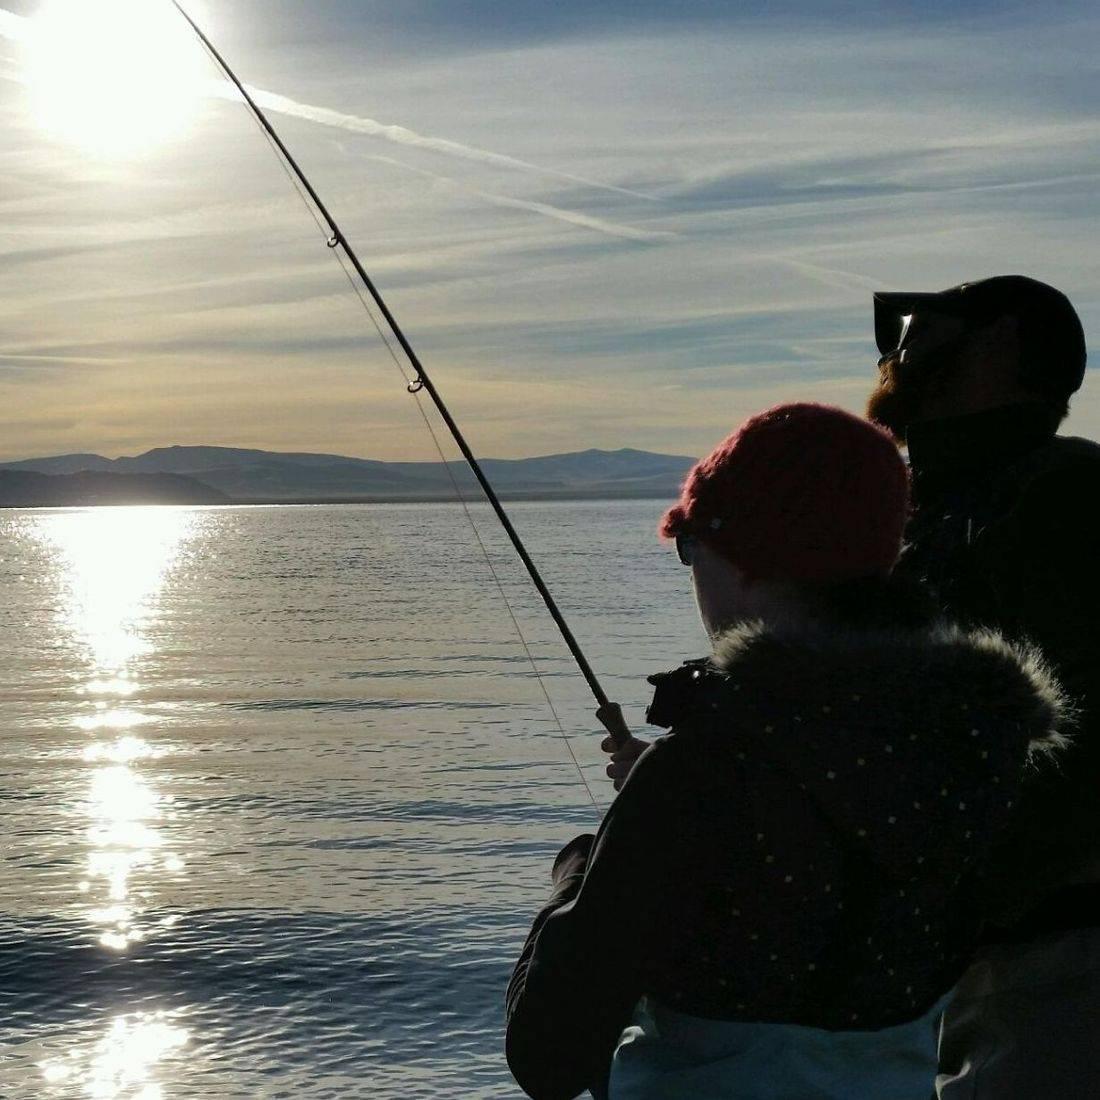 Pyramid Lake, Pyramid lake Nevada, Lahontan Cutthroat trout, trout, big trout, large trout, trout fishing, fly fishing, fishing, ladder fishing, nymph, beetle, midge, popcorn beetle, guide, guide service, Orvis, Orvis adventures, Orvis fly fishing, Orvis endorsed, Orvis endorsed guide